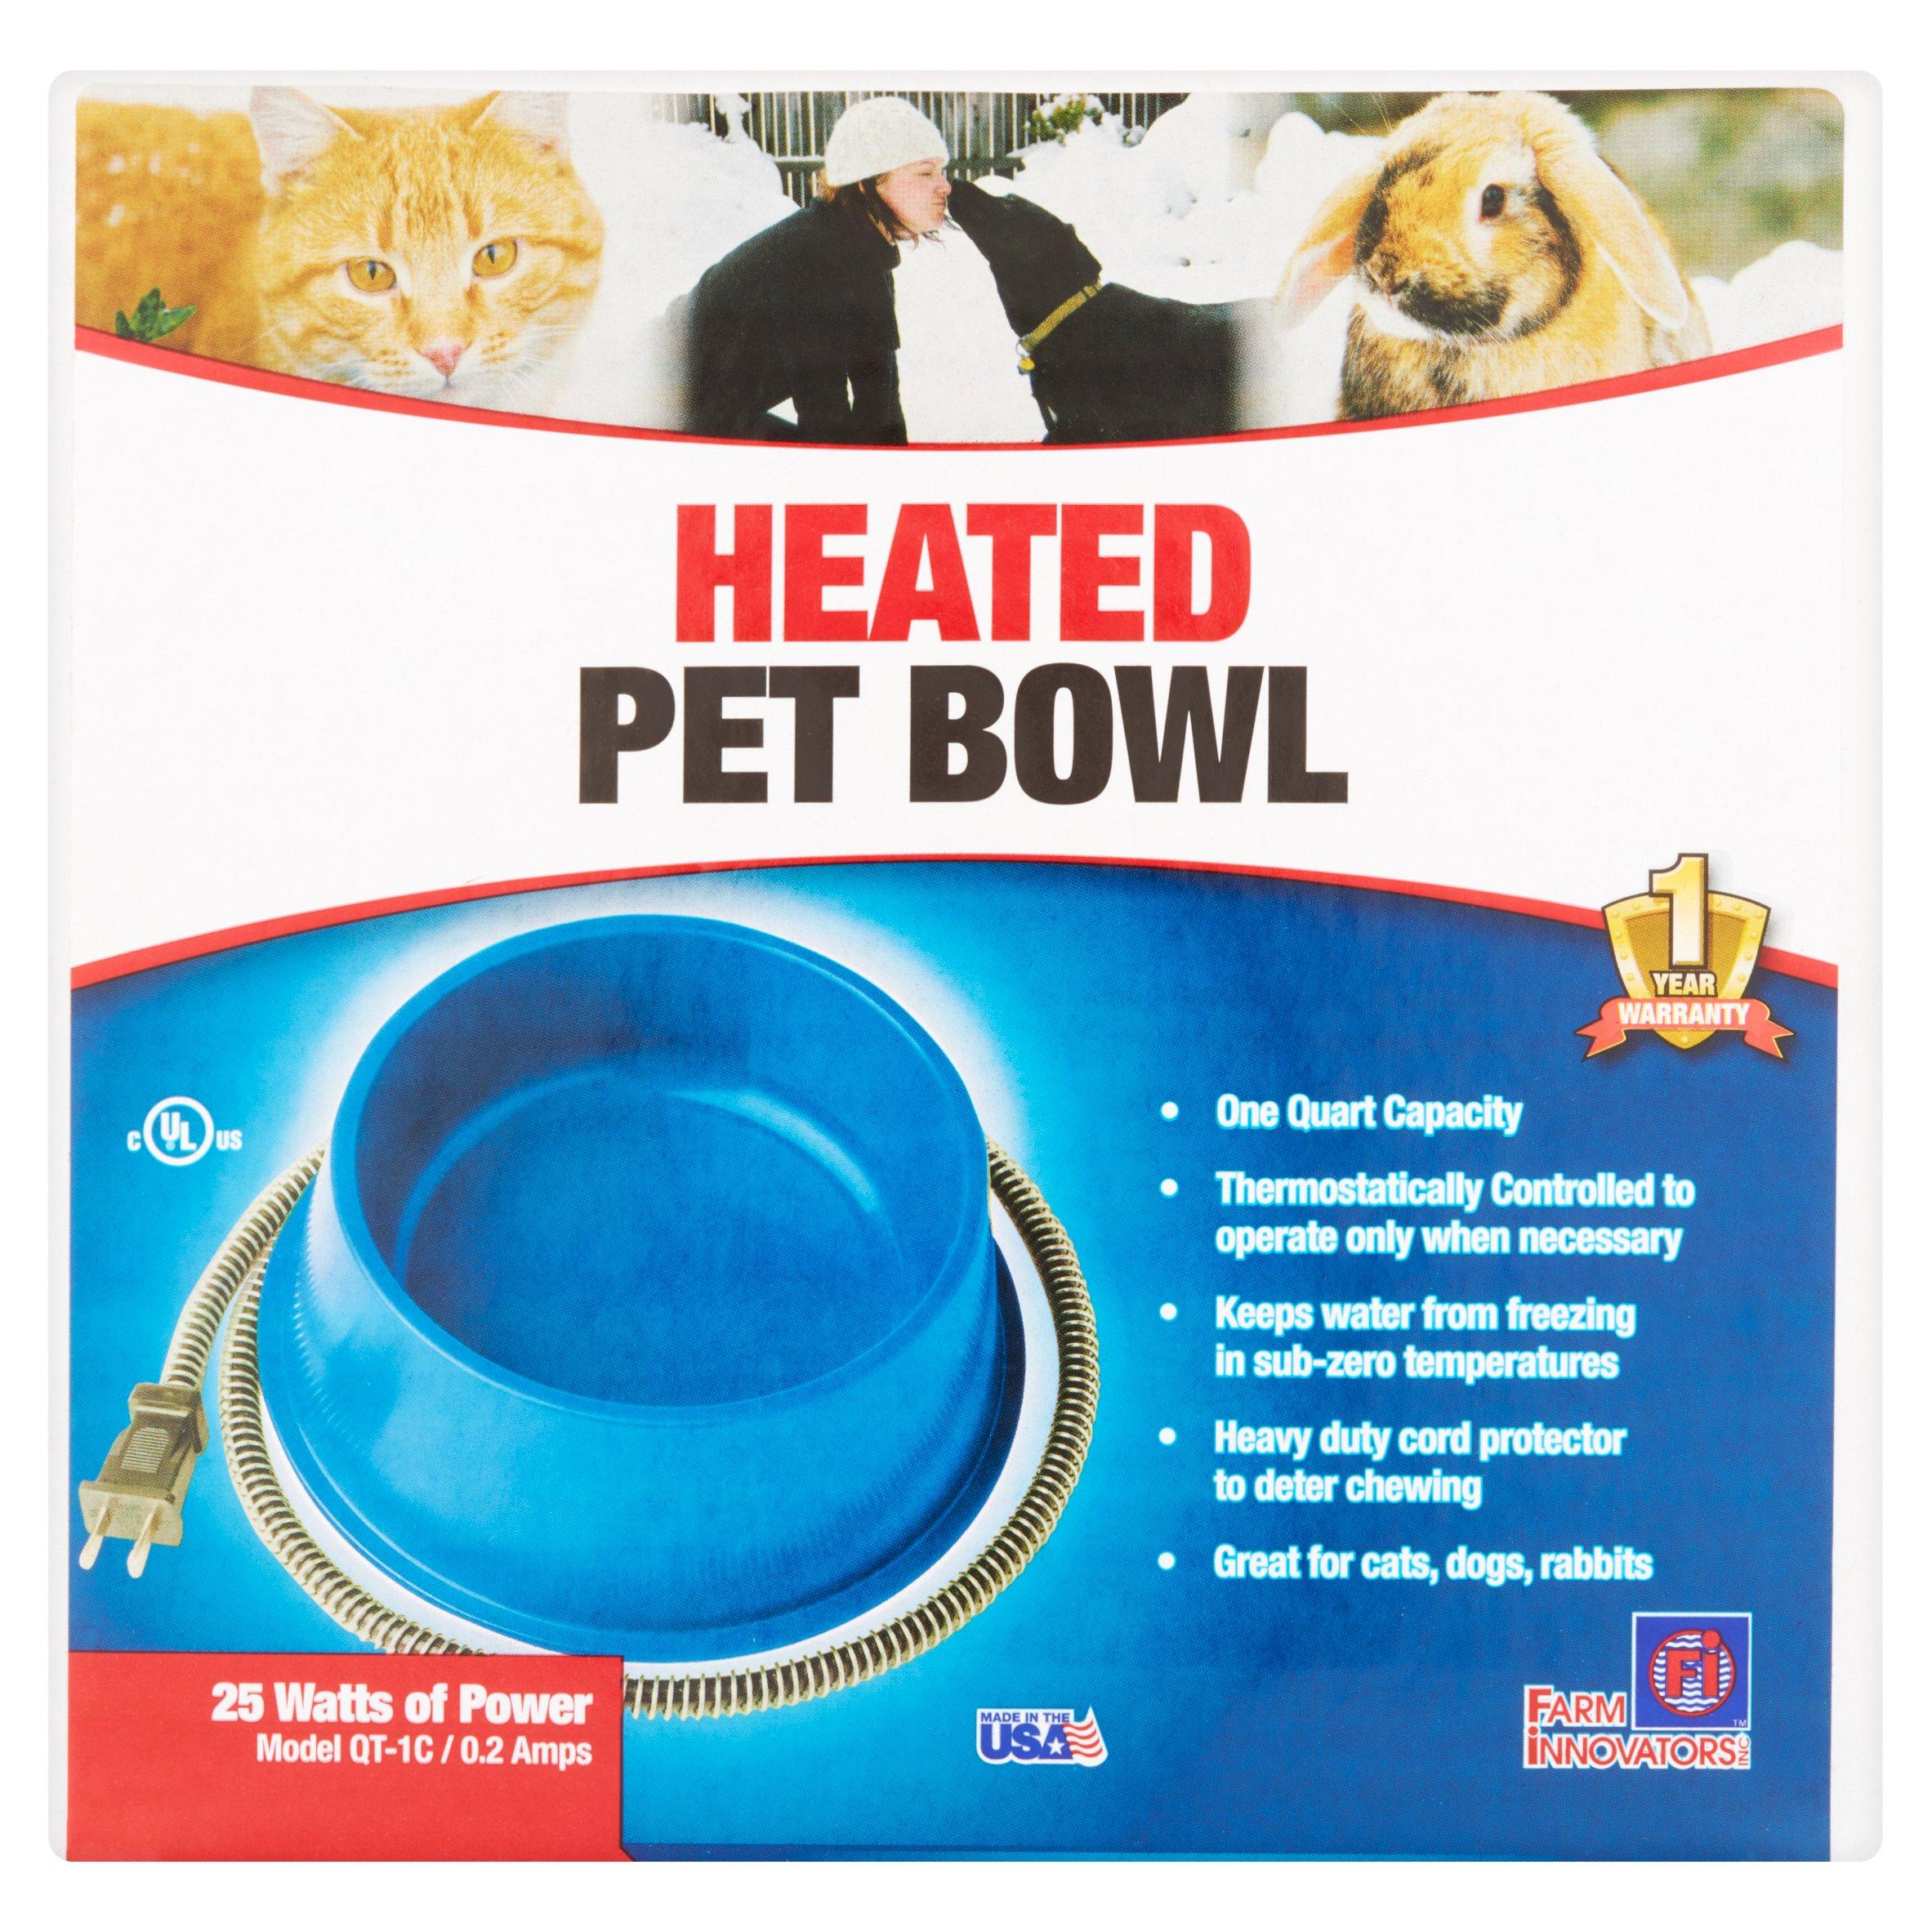 Farm Innovators 25 Watts of Power Heated Pet Bowl